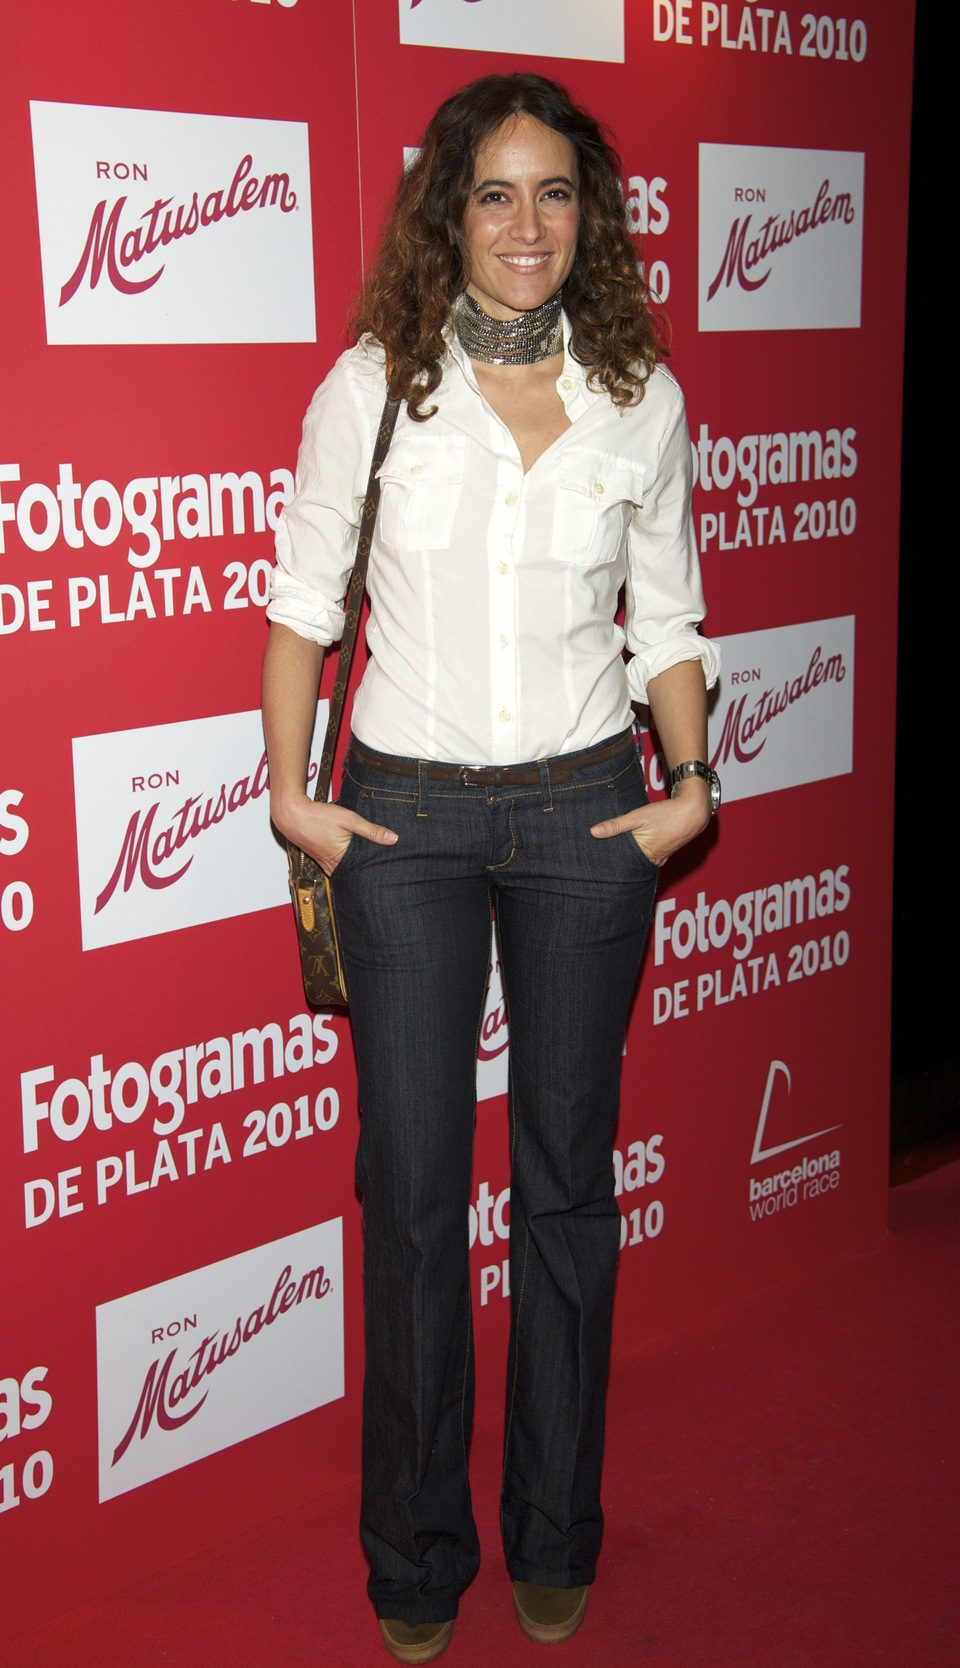 Ana Turpin en los Fotogramas 2010